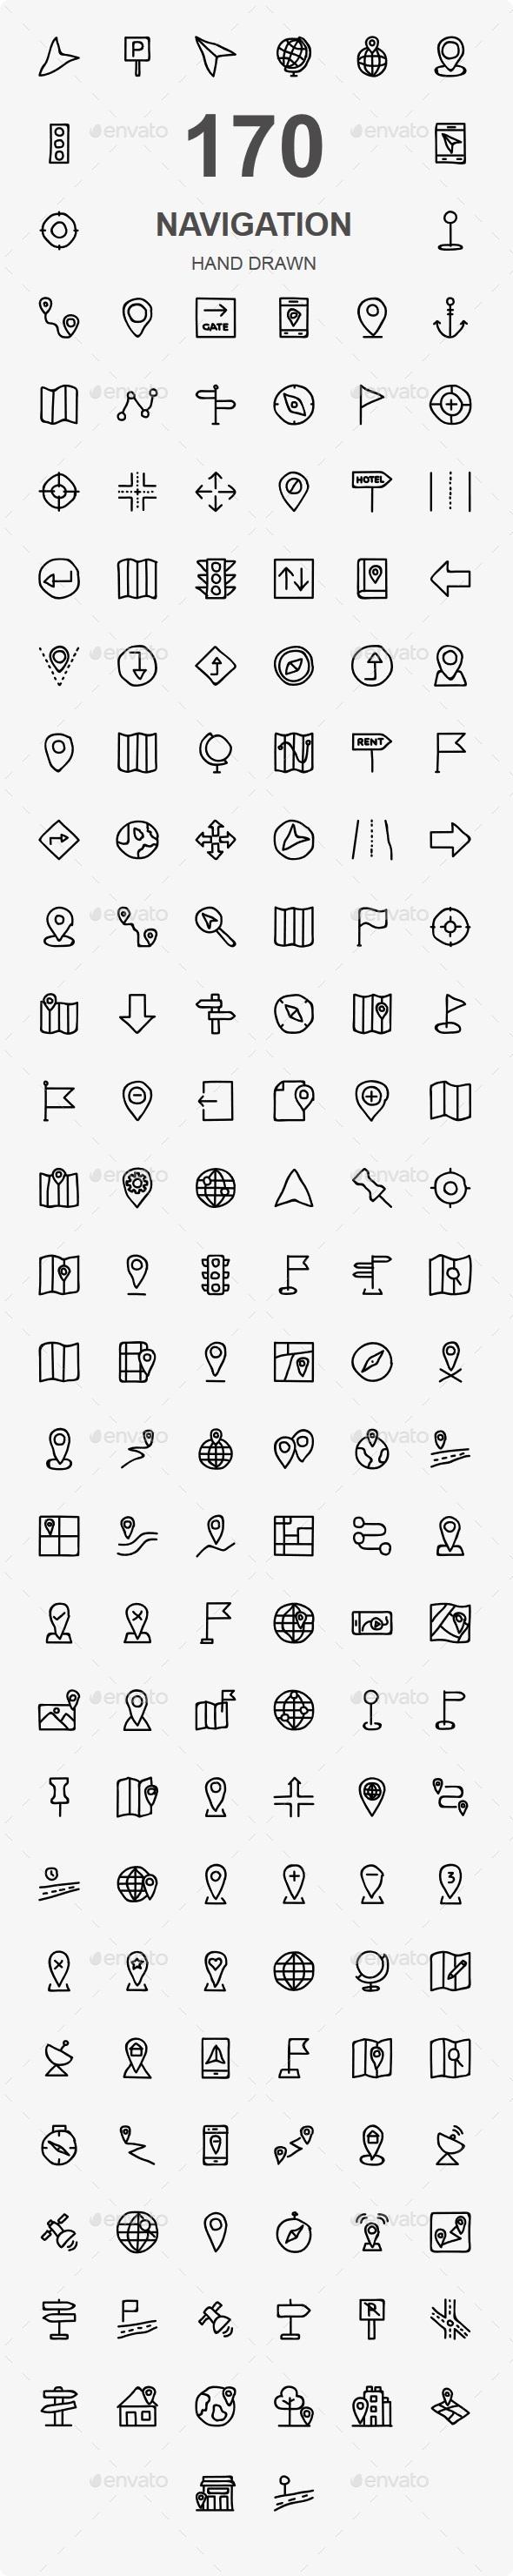 Map and Navigation Hand Drawn - Web Icons